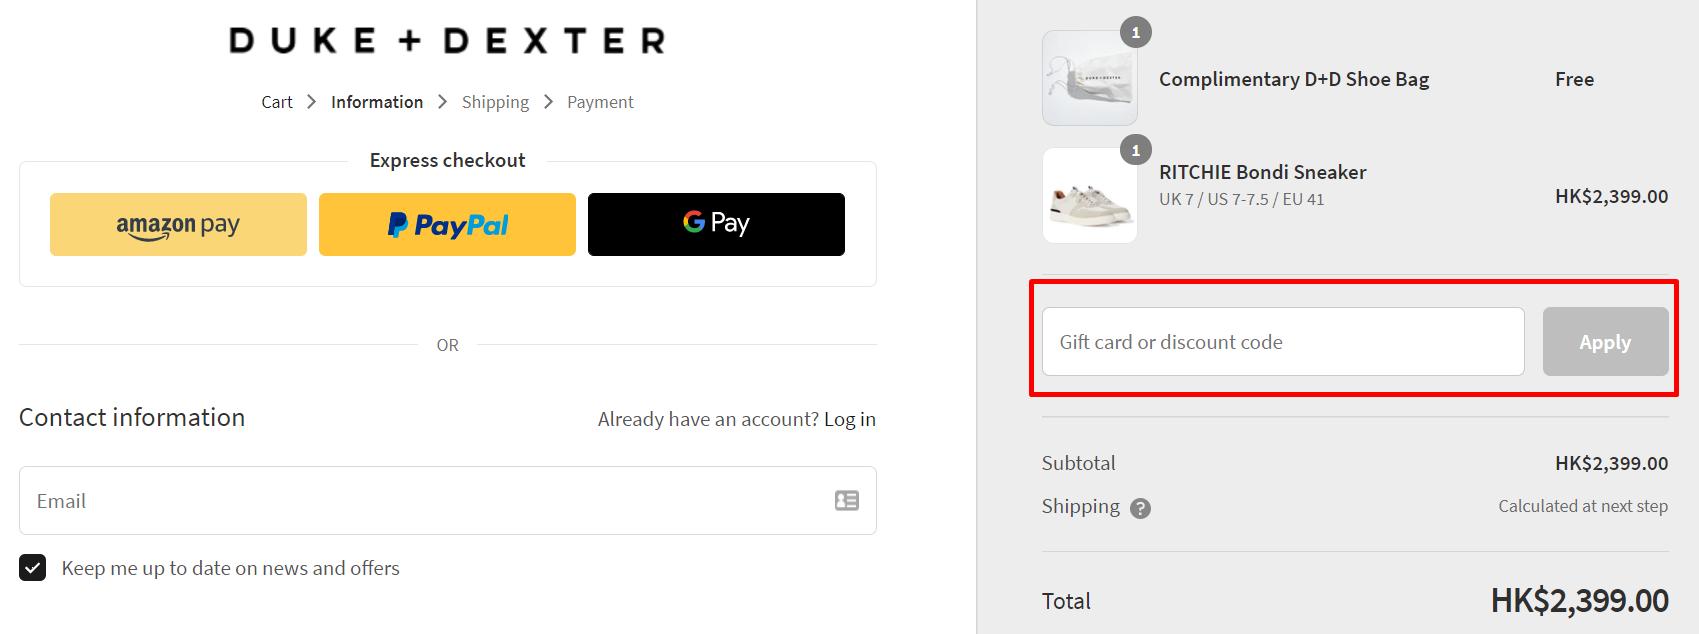 How do I use my Duke & Dexter discount code?